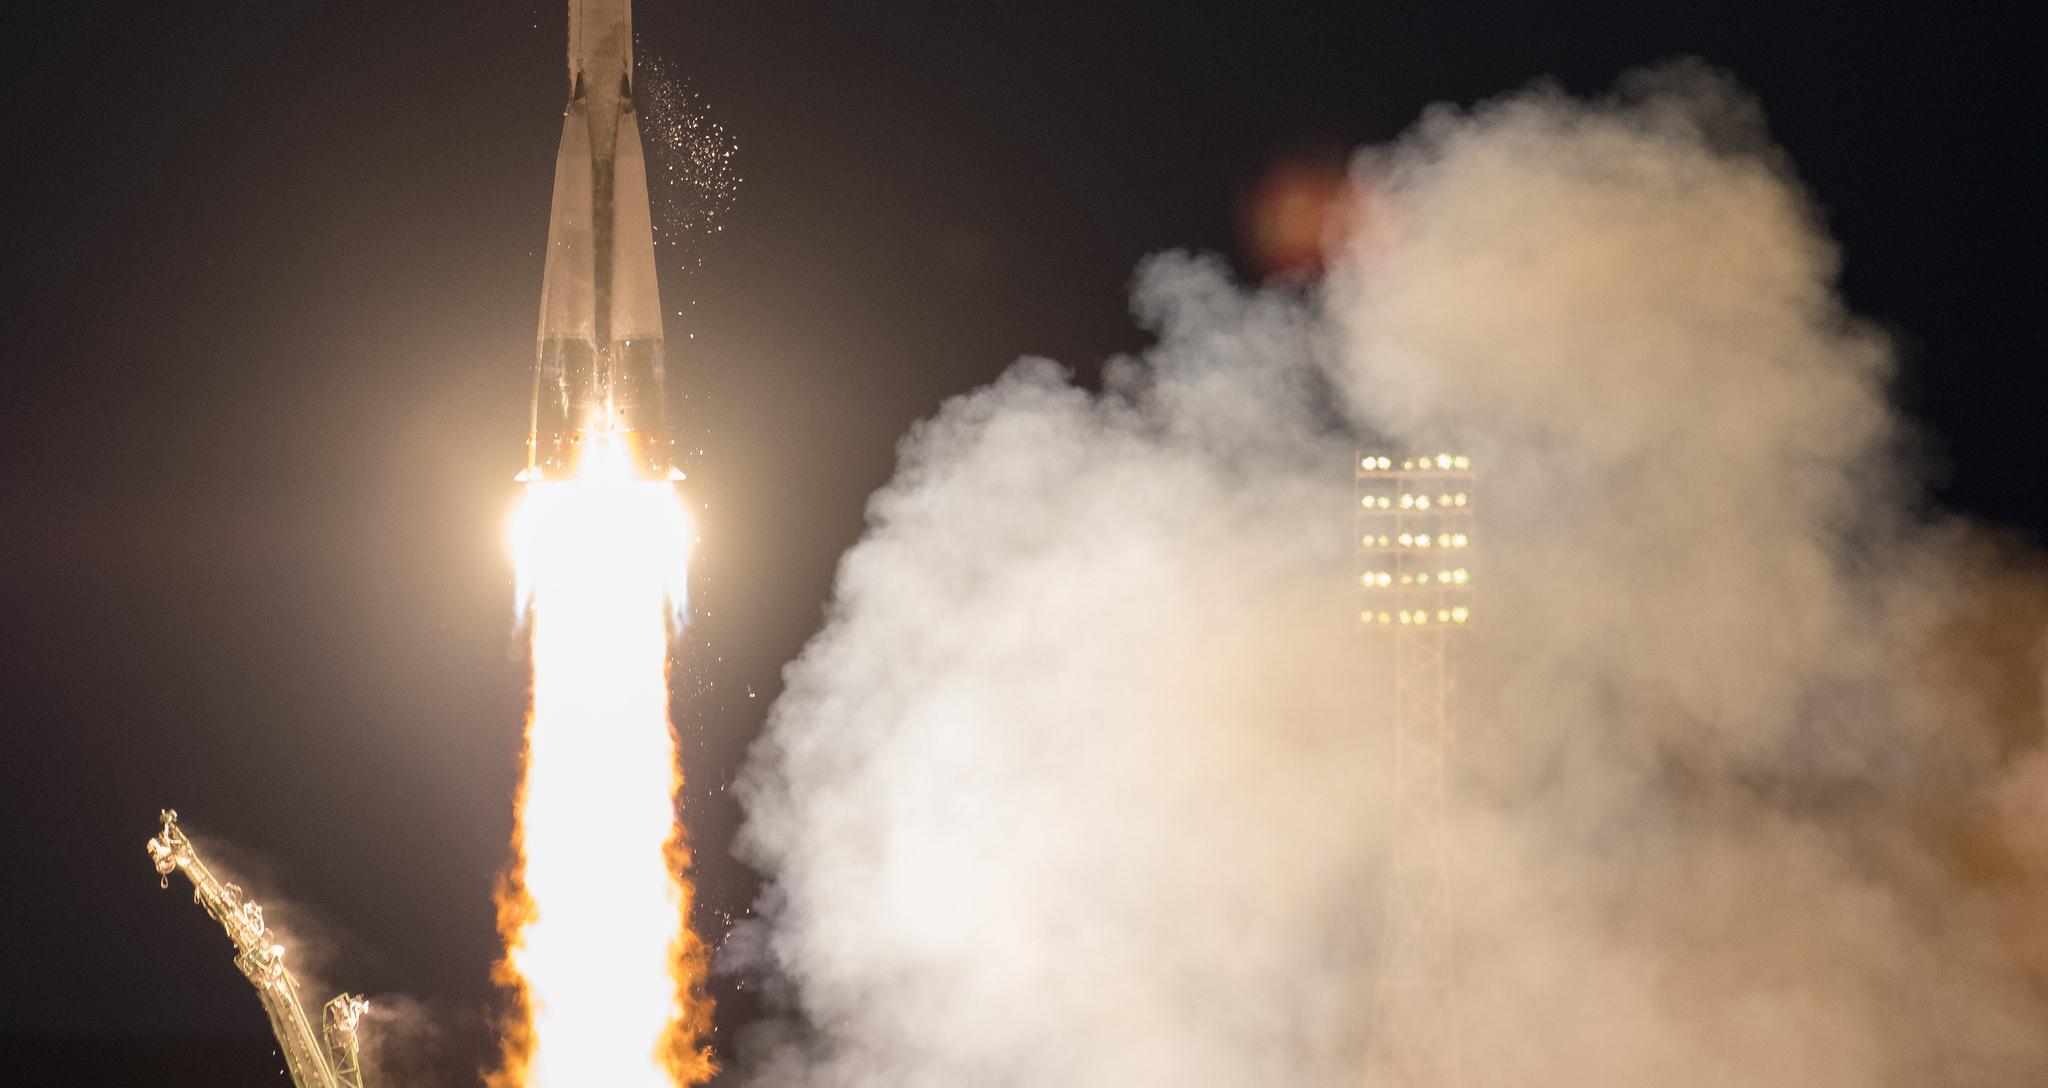 Soyuz MS-05 launches toward the International Space Station. Credit: NASA/Joel Kowsky